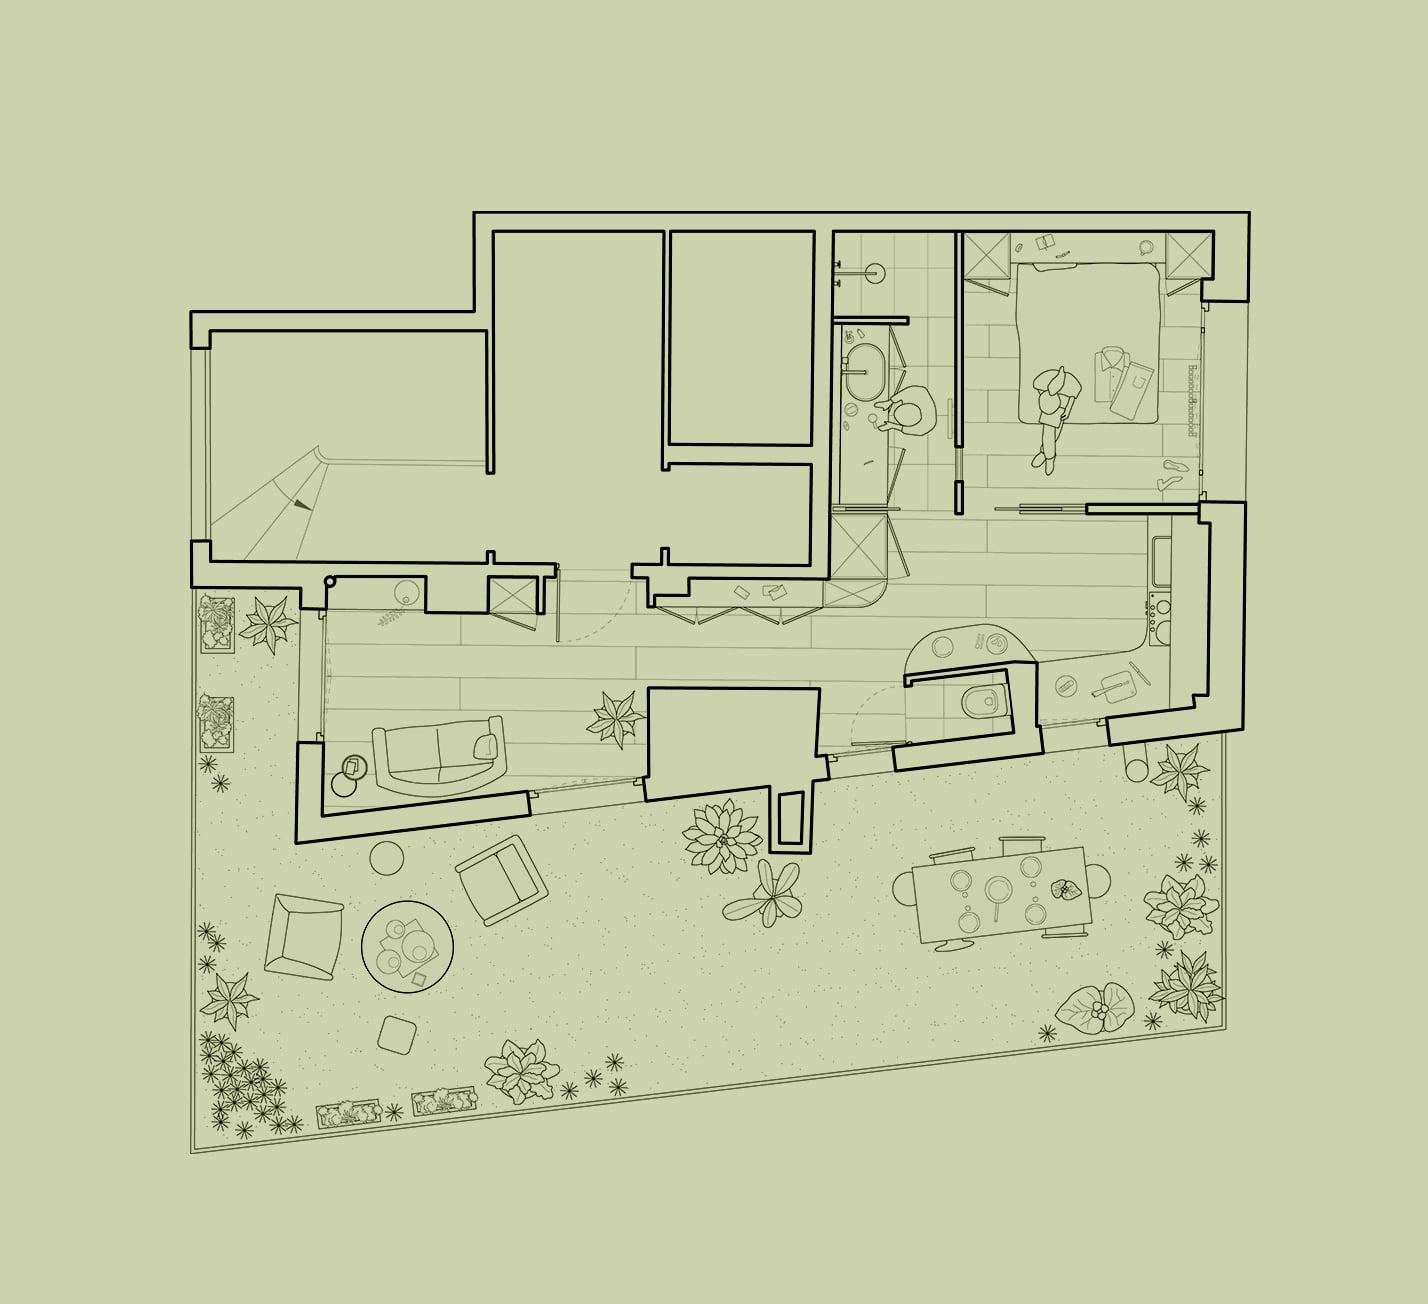 Appartement-Gabriel-Psd-dessins-01-min